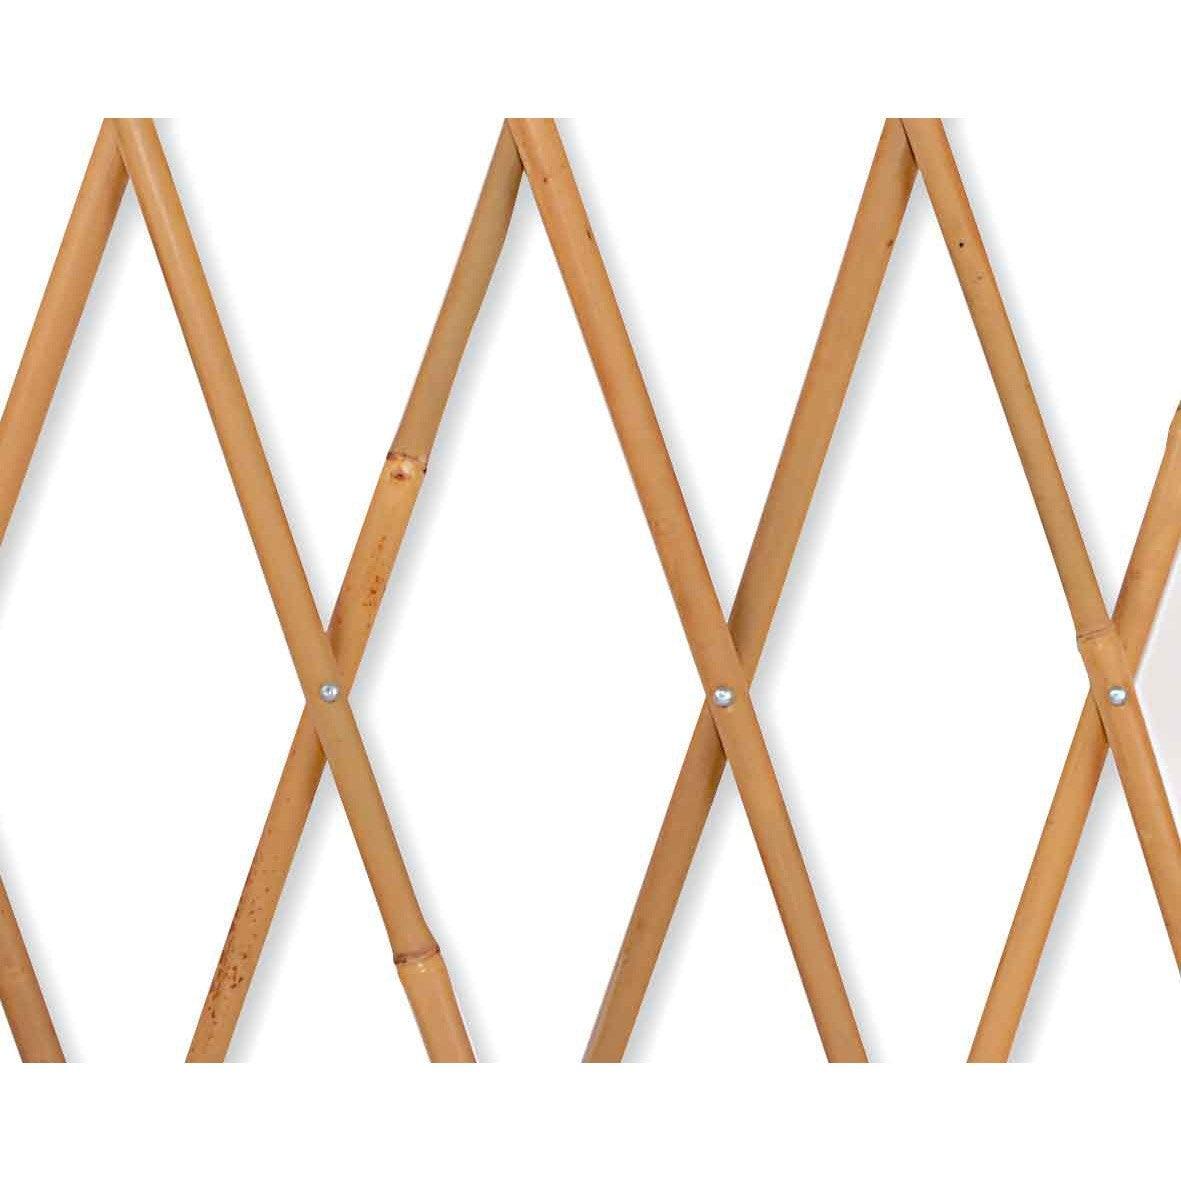 treillage extensible droite en bois jany tradition x x p 3 cm leroy merlin. Black Bedroom Furniture Sets. Home Design Ideas